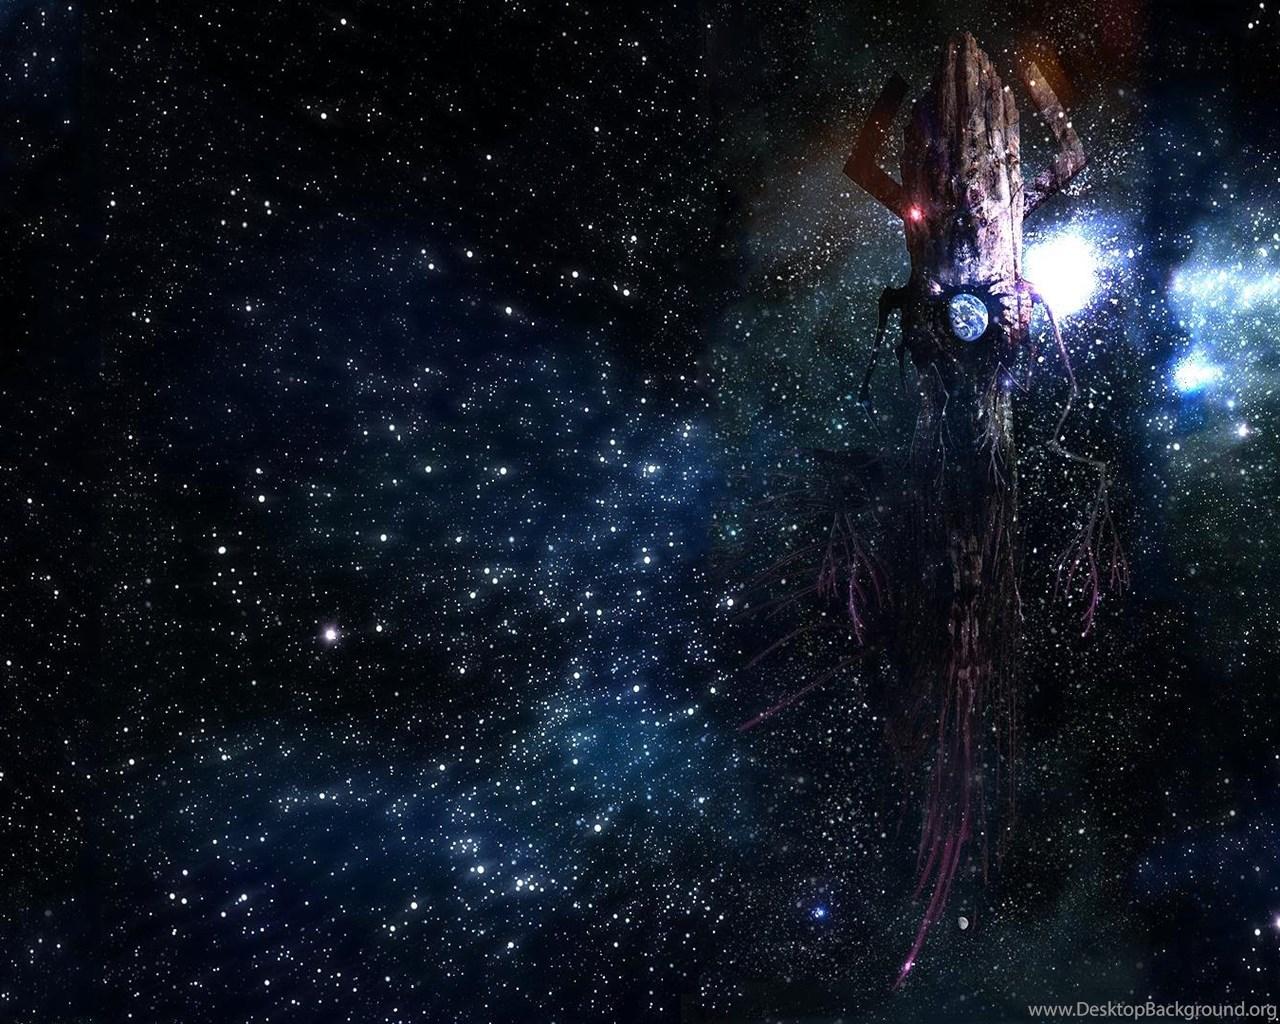 Space galactus wallpapers hd wallpapers hd 4k wallpapers - Space wallpaper 4k for mobile ...